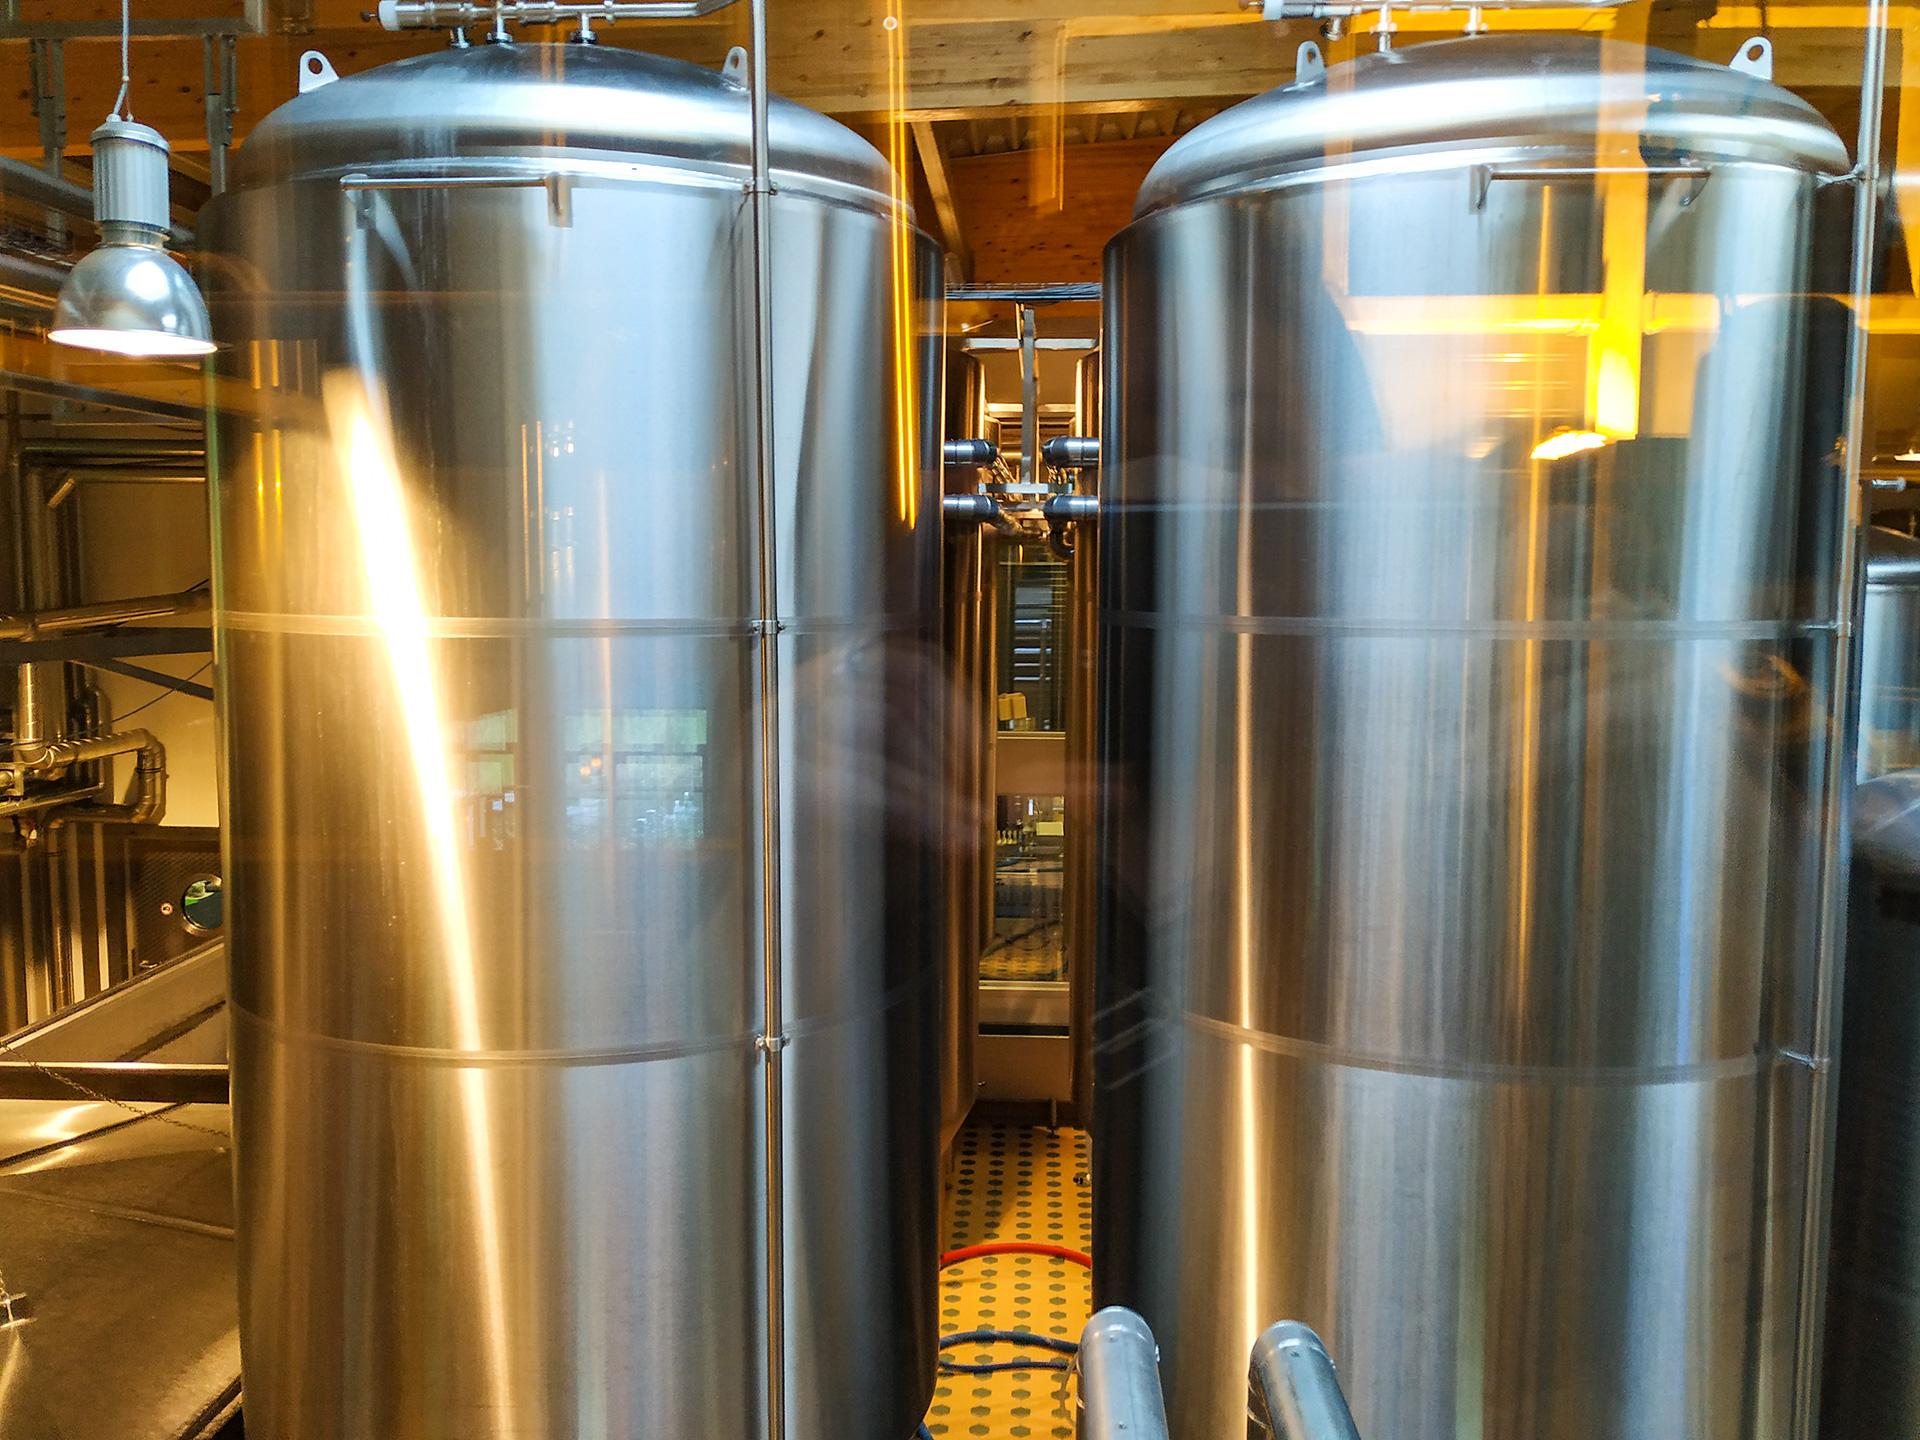 Browar Rugia – tanki z piwem